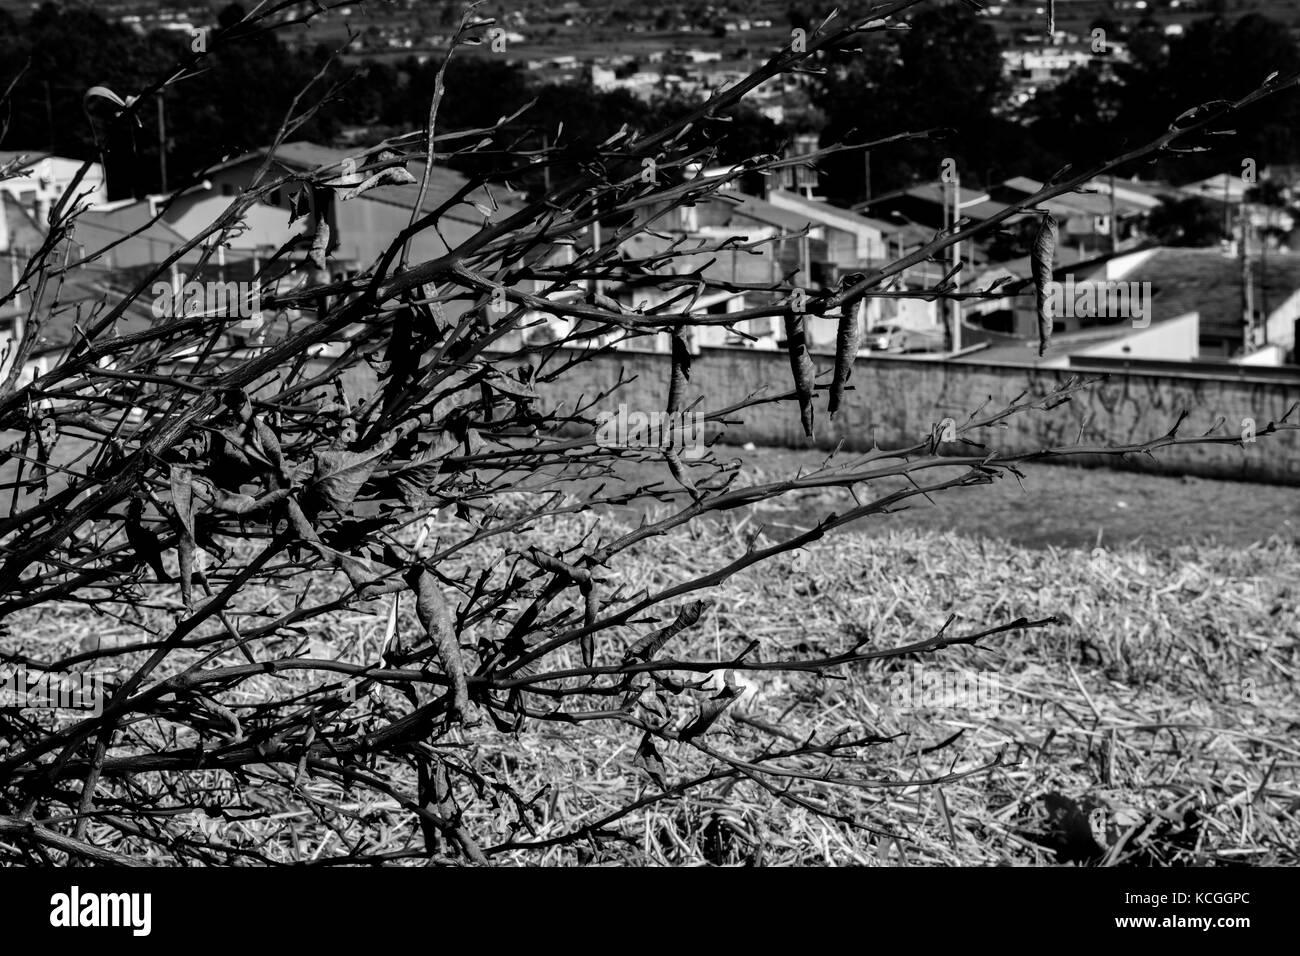 Arbusto no brasil Immagini Stock